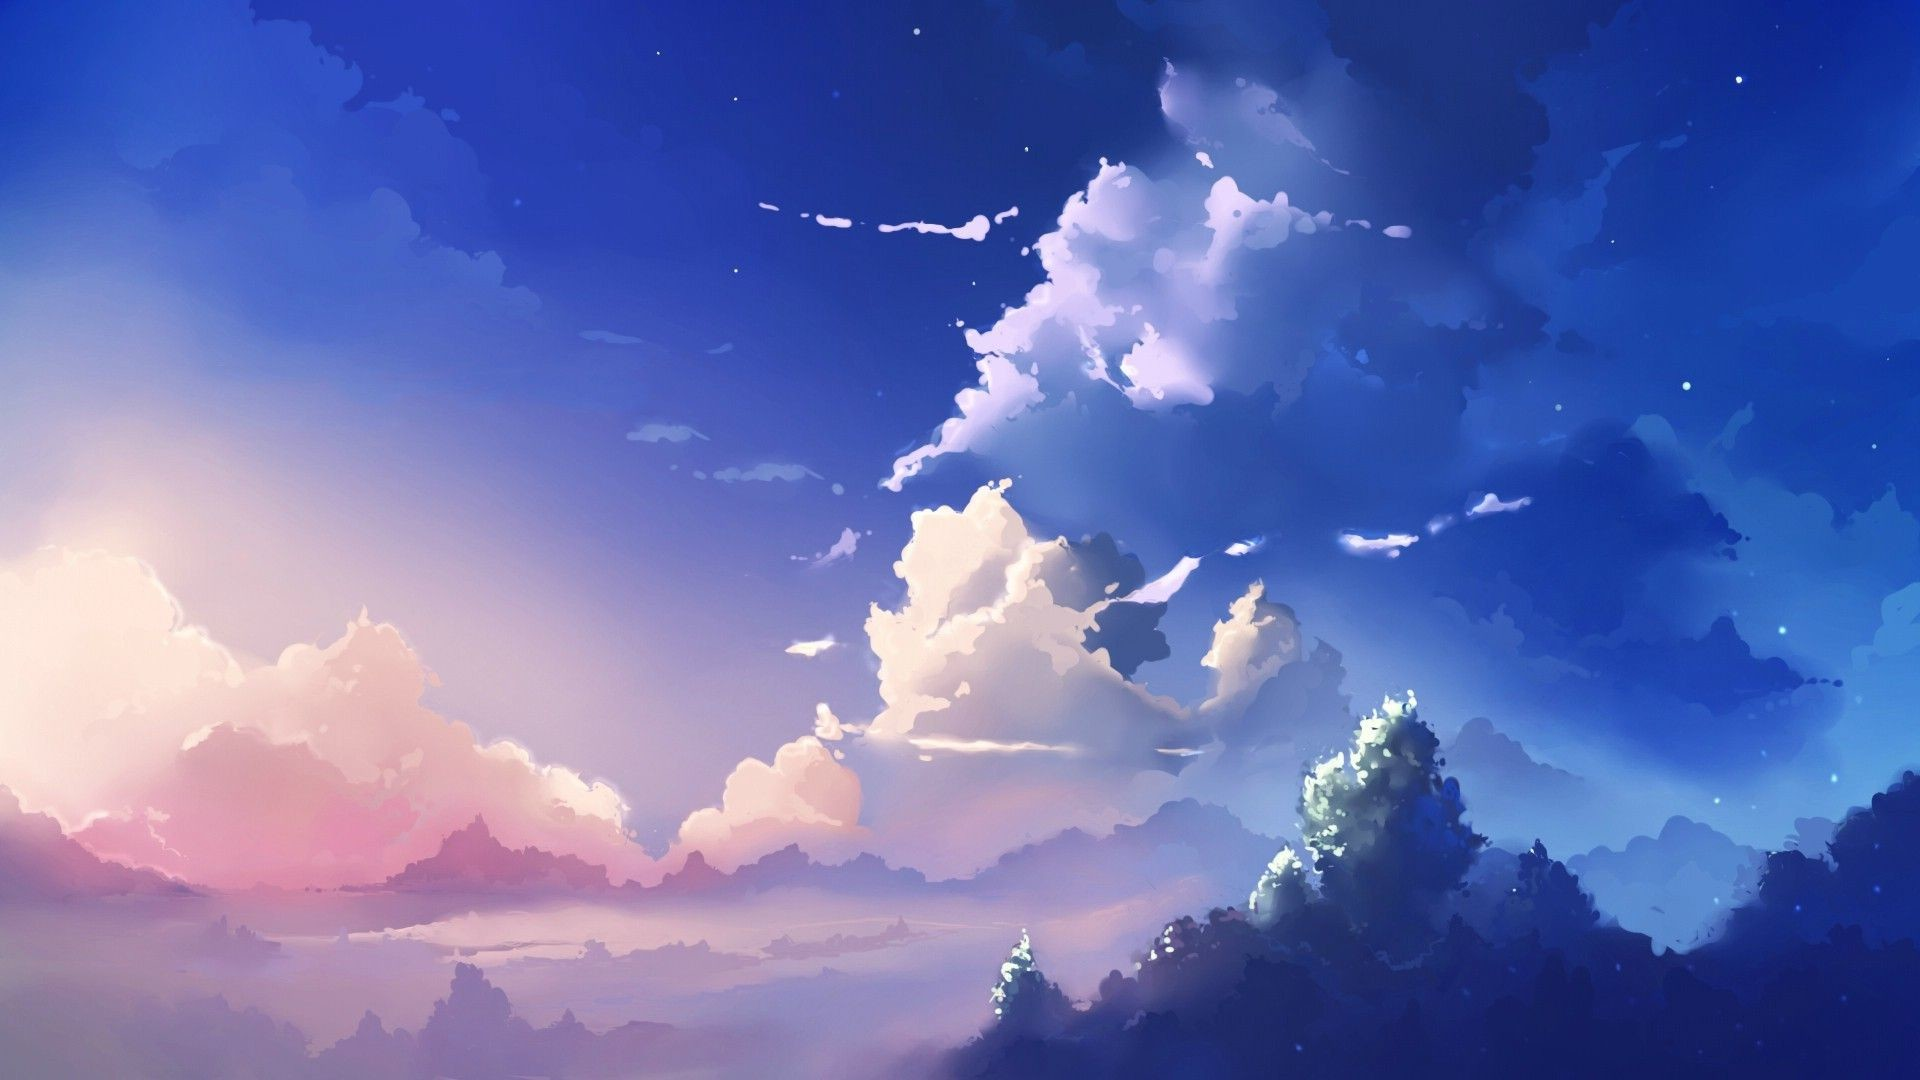 Anime Sky Scenery, Cloud Scenery 05